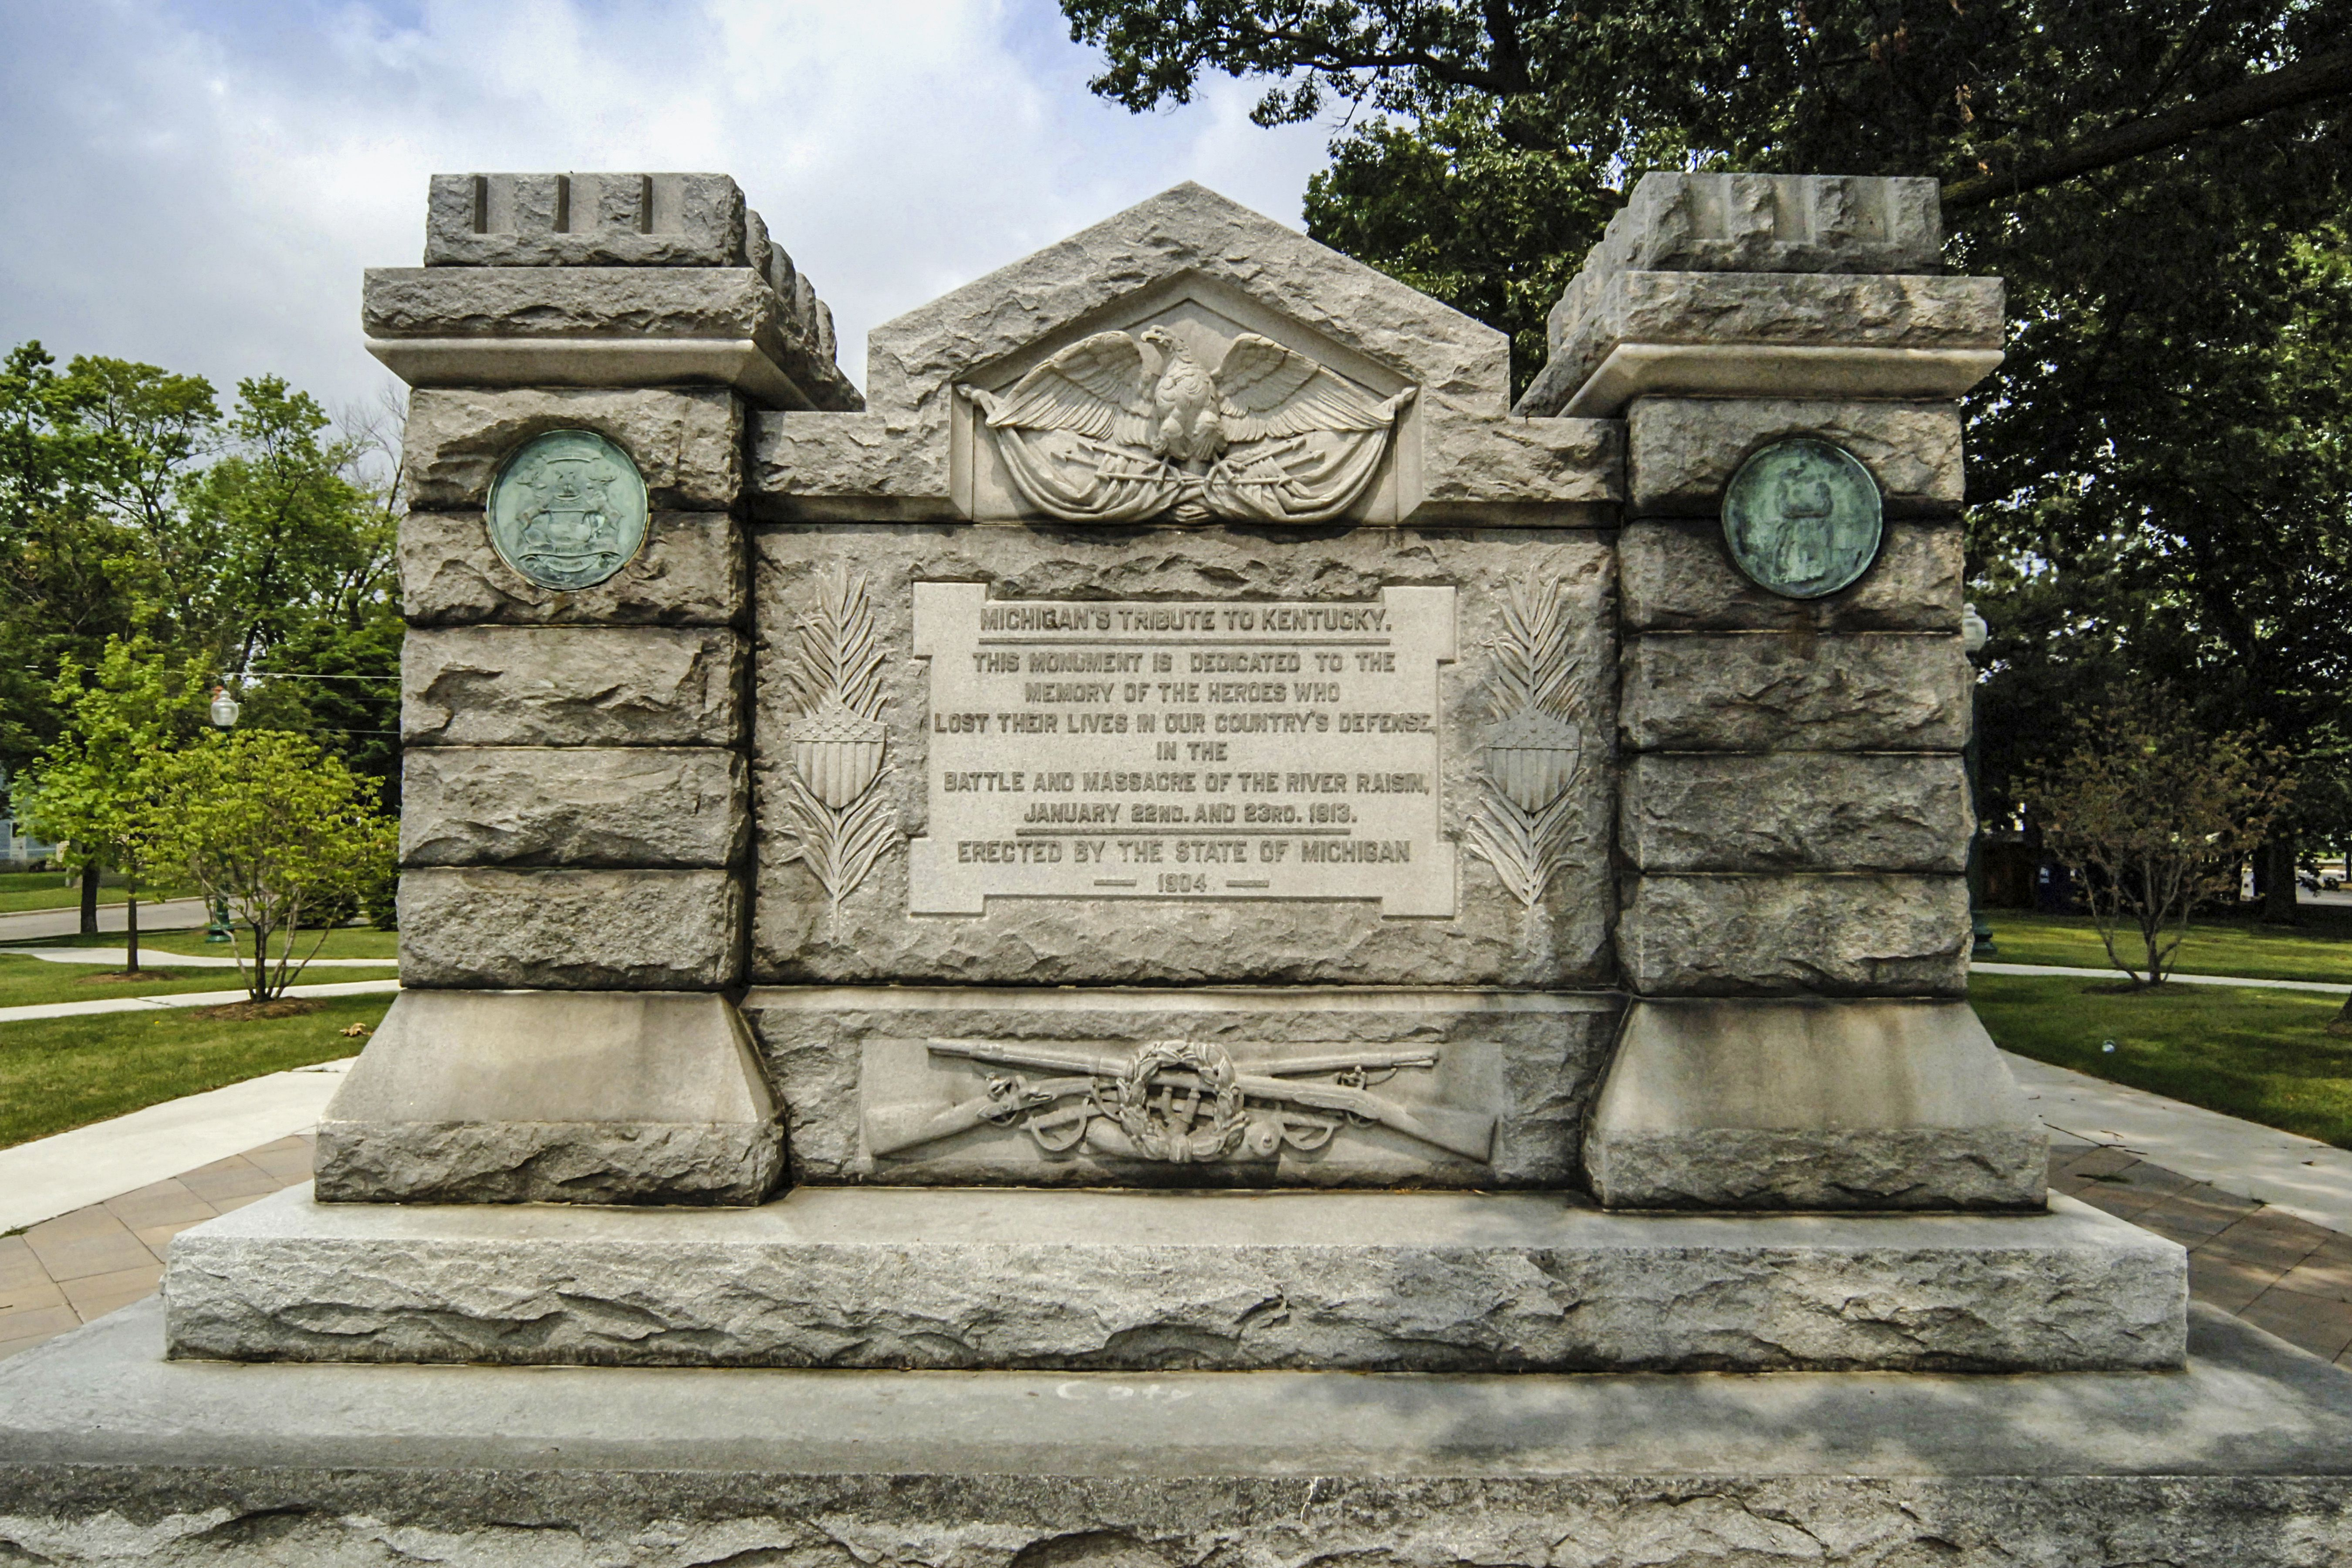 The Battle of River Raisin war memorial in Monroe, MI